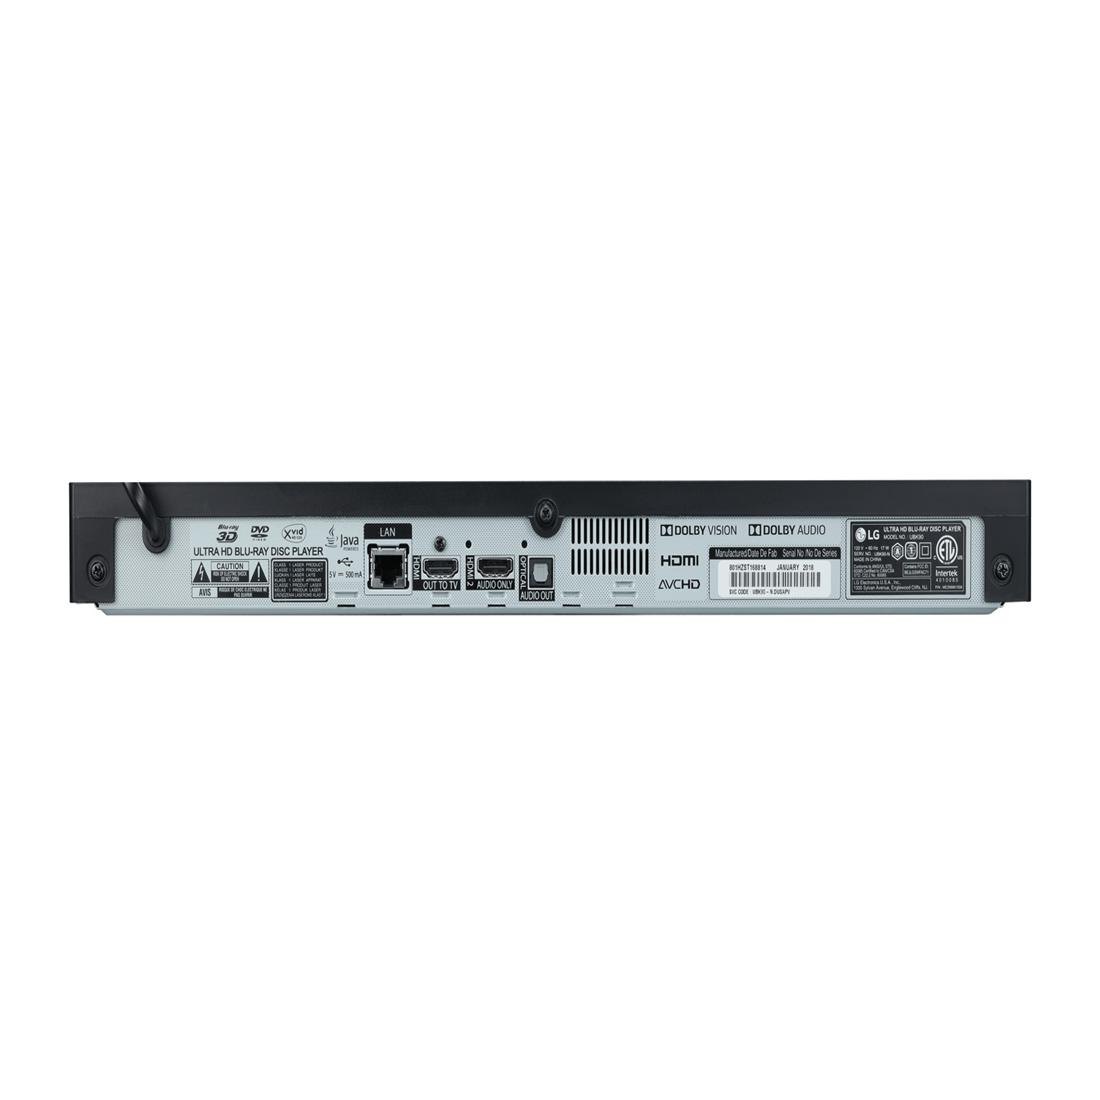 LG HU80KA 4K UHD Laser CineBeam Projector | UBK90 4K Disc Player